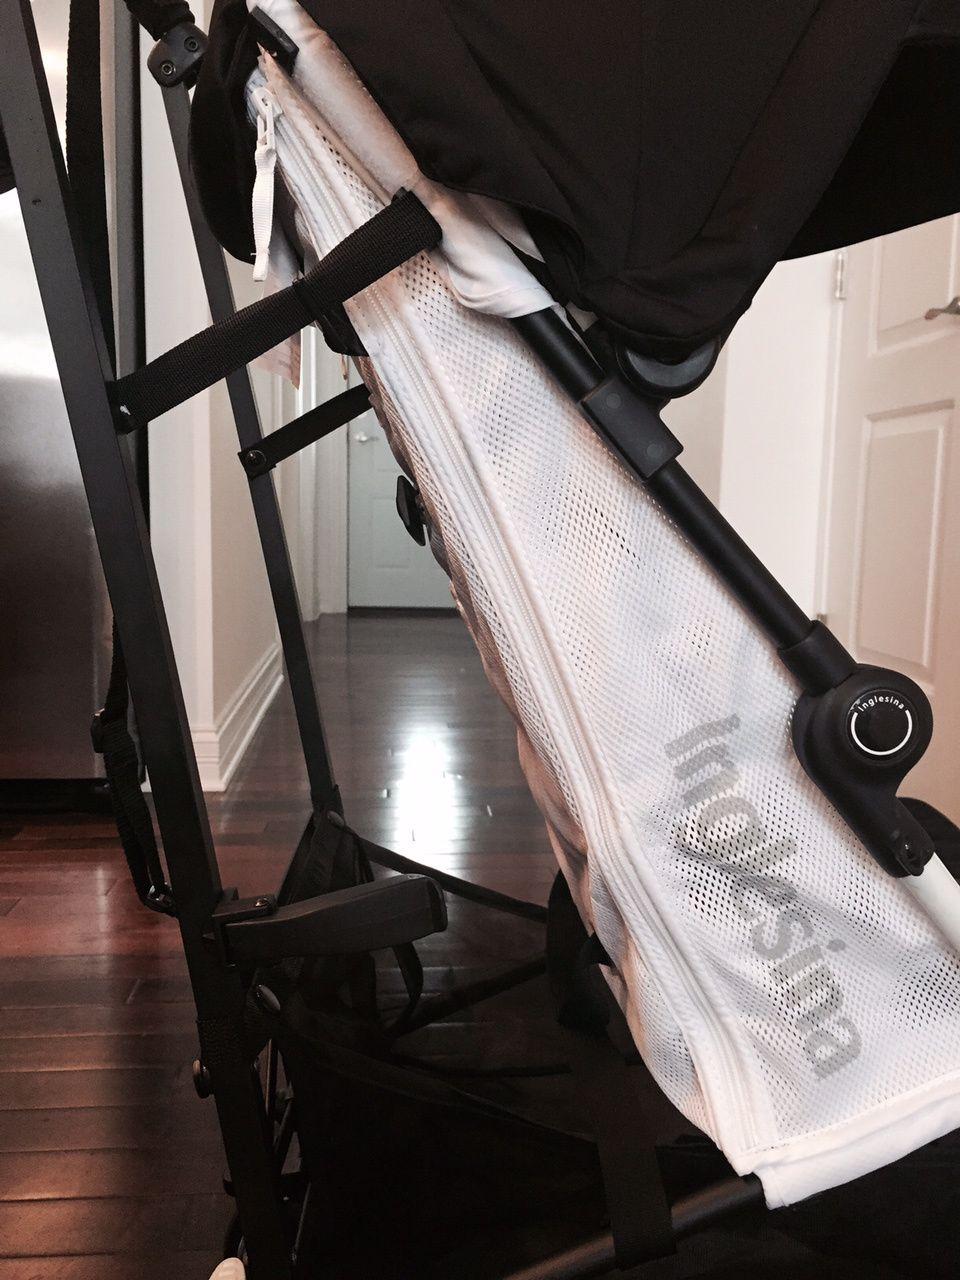 Baby Cargo 200 Series Lightweight Umbrella Stroller Review